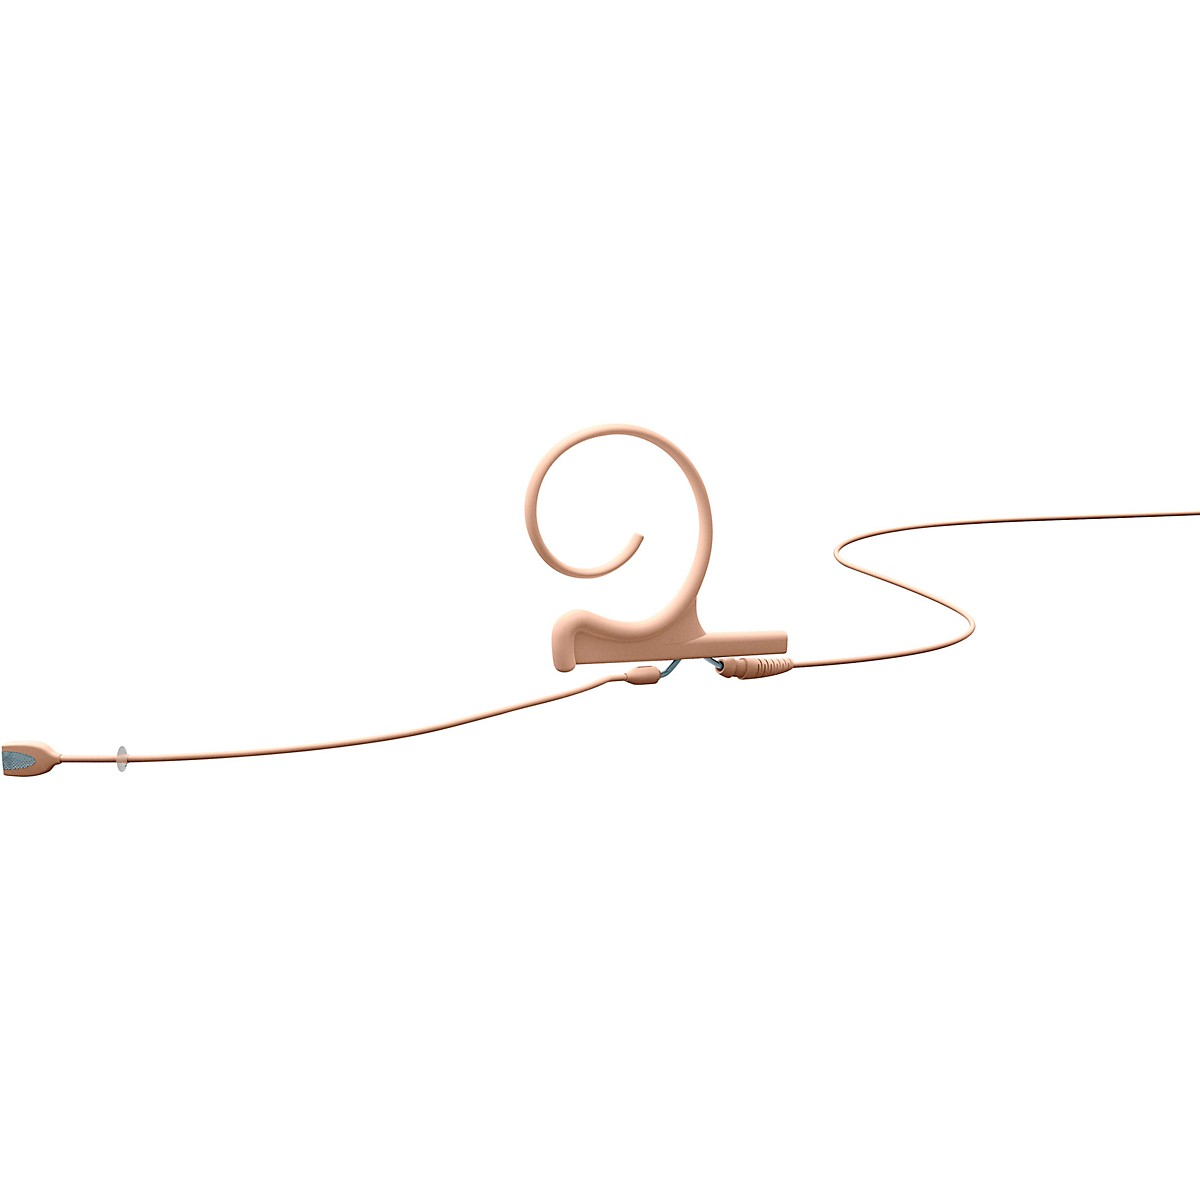 DPA Microphones d:fine Flex Directional Slim Headset Microphone Single Ear, 100mm Boom, Hardwired 3.5mm Mini Jack, Beige